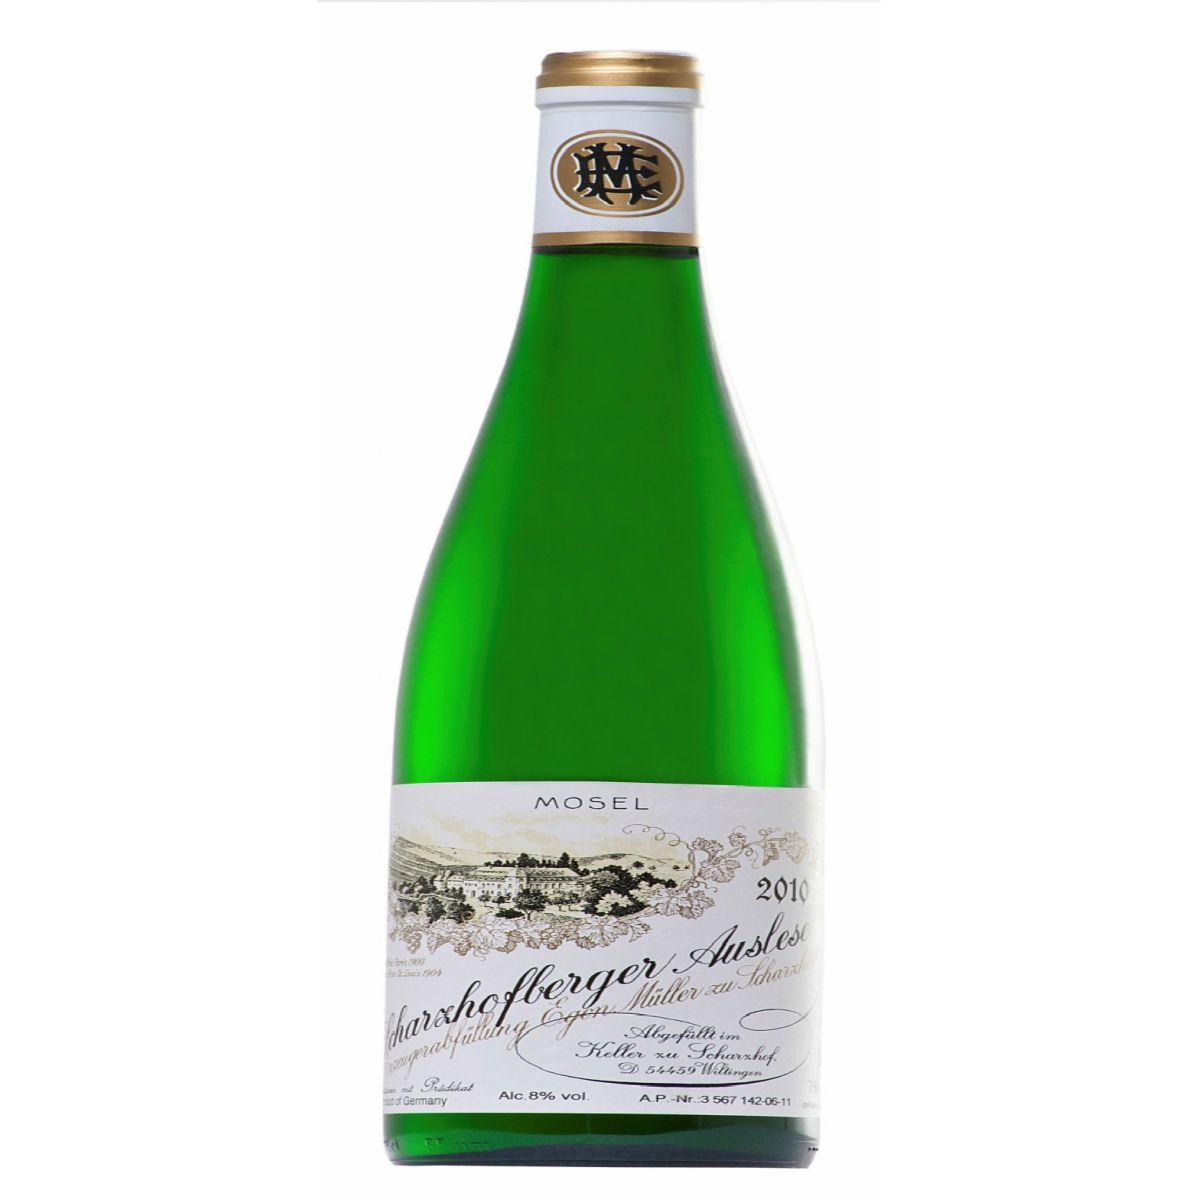 Vinho Alemão Vinho Egon Muller Riesling - Scharzhofberger Auslese 2010(750ml)